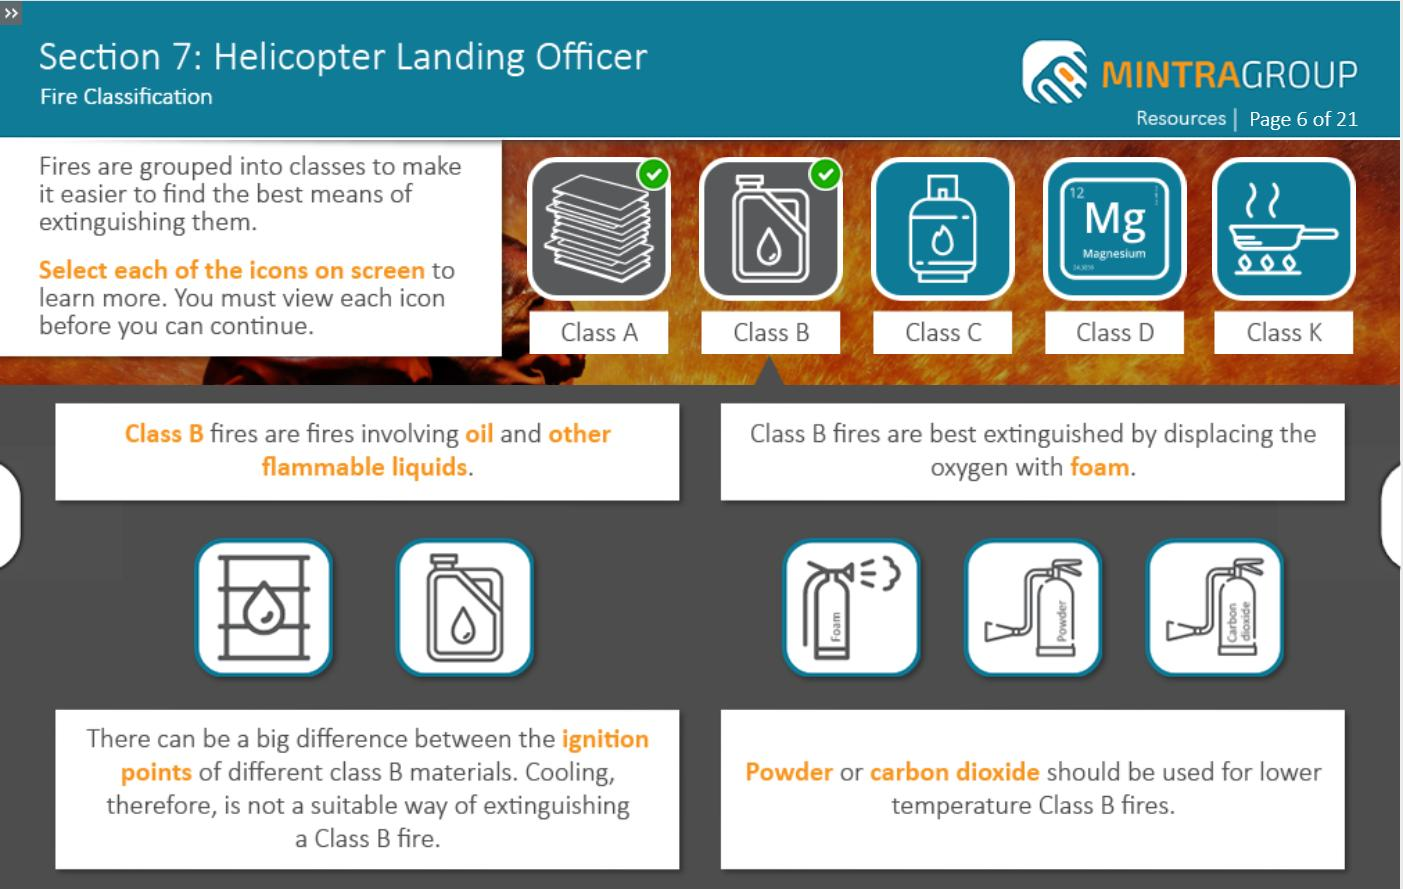 Helicopter Landing Officer (HLO) Training